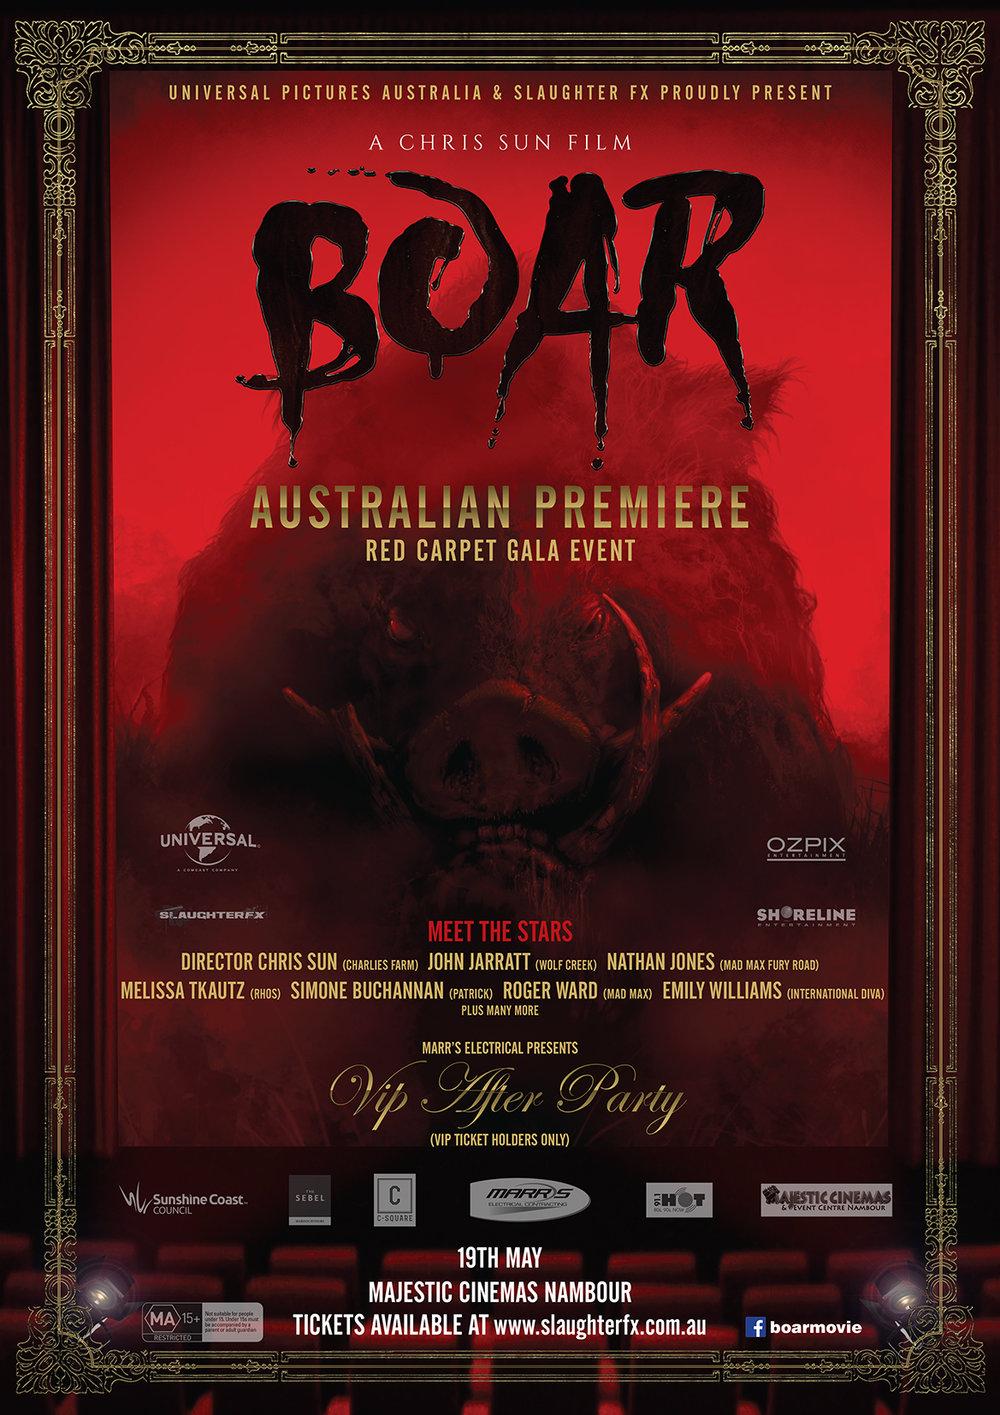 Boar_Premiere_Glitzy_A3-Sponsors-PRINT-NoTrimMarks_LR.jpg